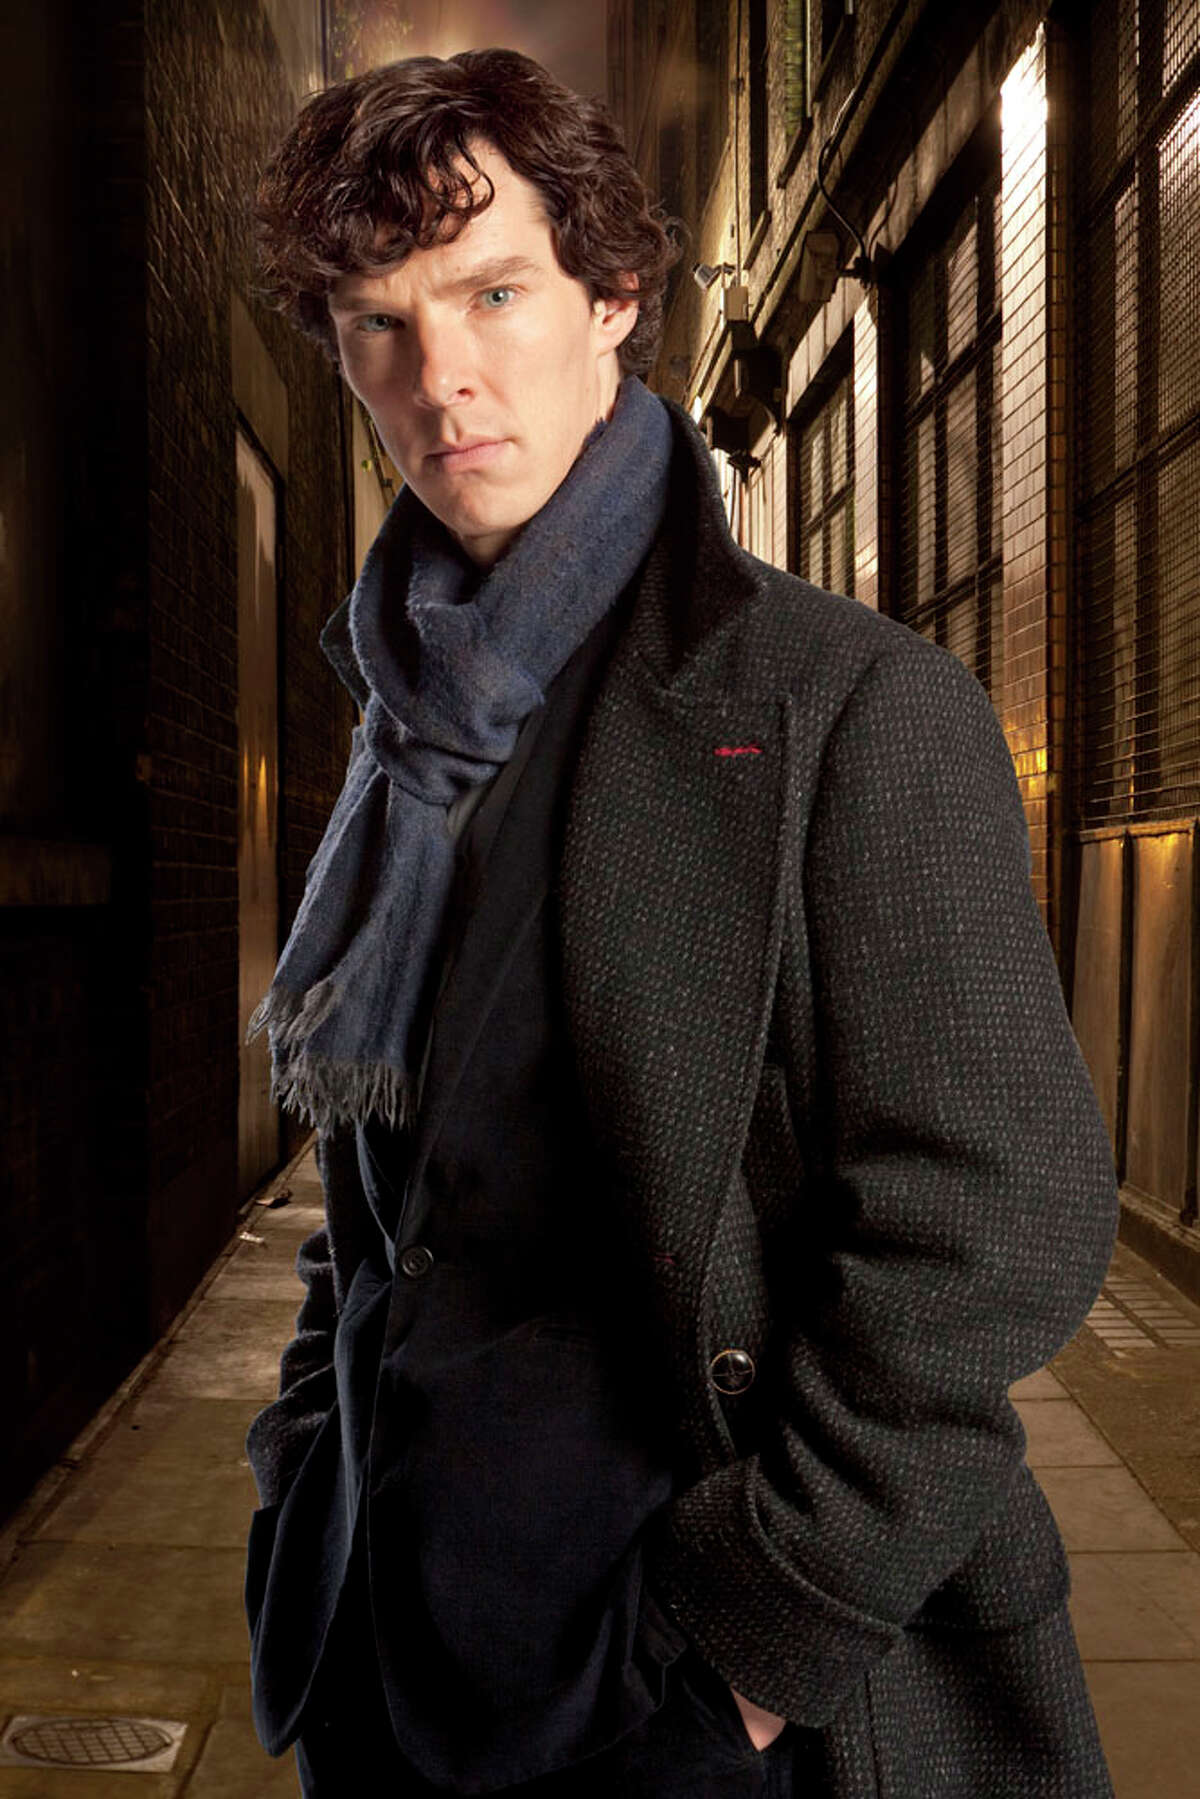 Benedict Cumberbatch portrays Sherlock Holmes in